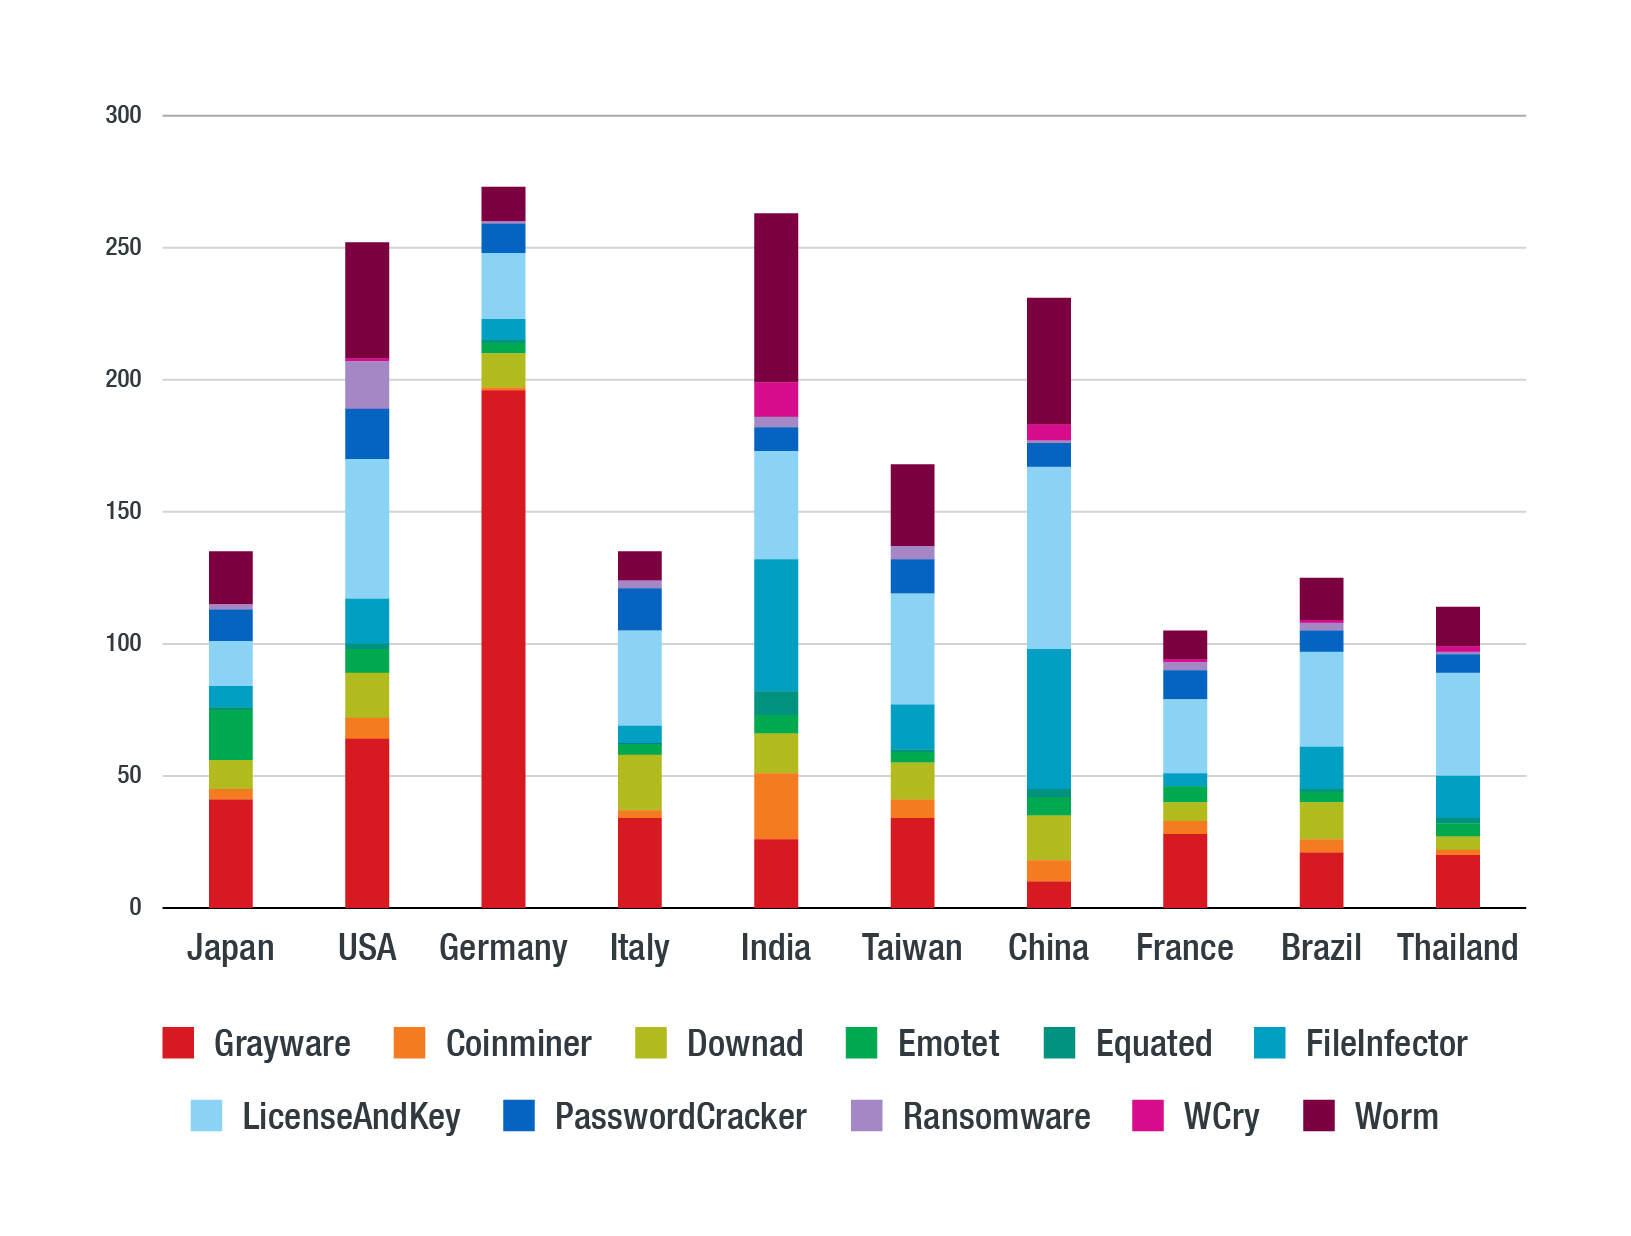 Figure 2. Breakdown of detected threat types